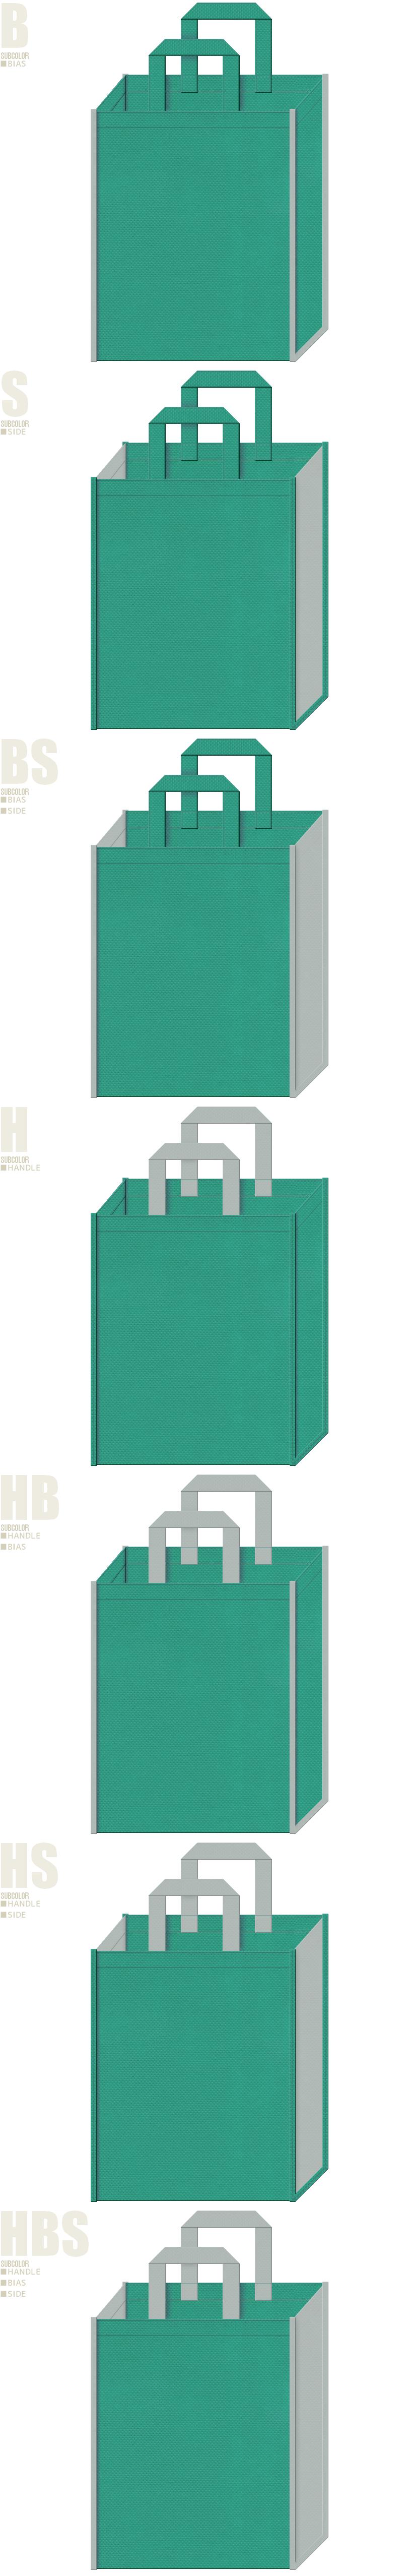 CO2削減・緑化地域・緑化コンクリート・屋上緑化・壁面緑化・建築・設計・エクステリアの展示会用バッグにお奨めの不織布バッグデザイン:青緑色とグレー色の配色7パターン